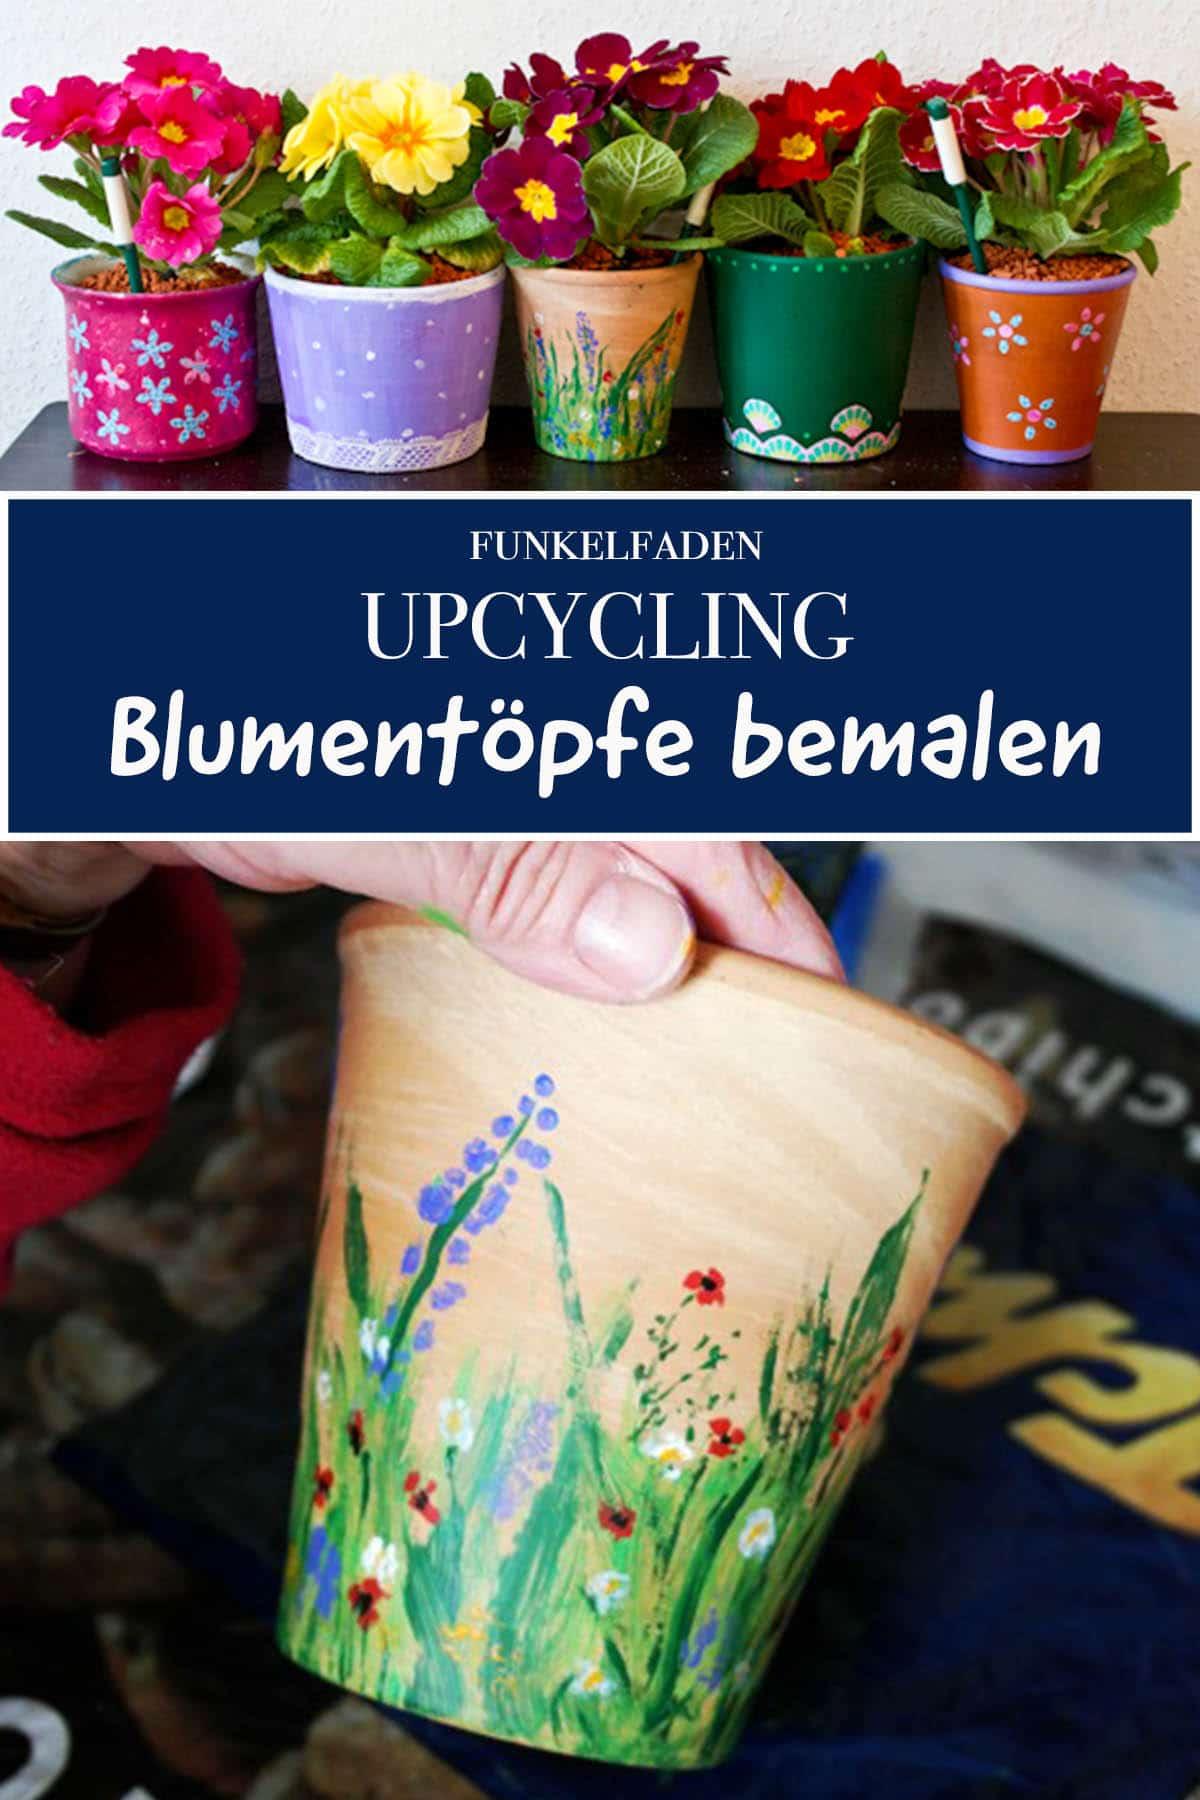 Alte Blumentopfe Bemalen Upcycling Fur Blumentopfe Diy